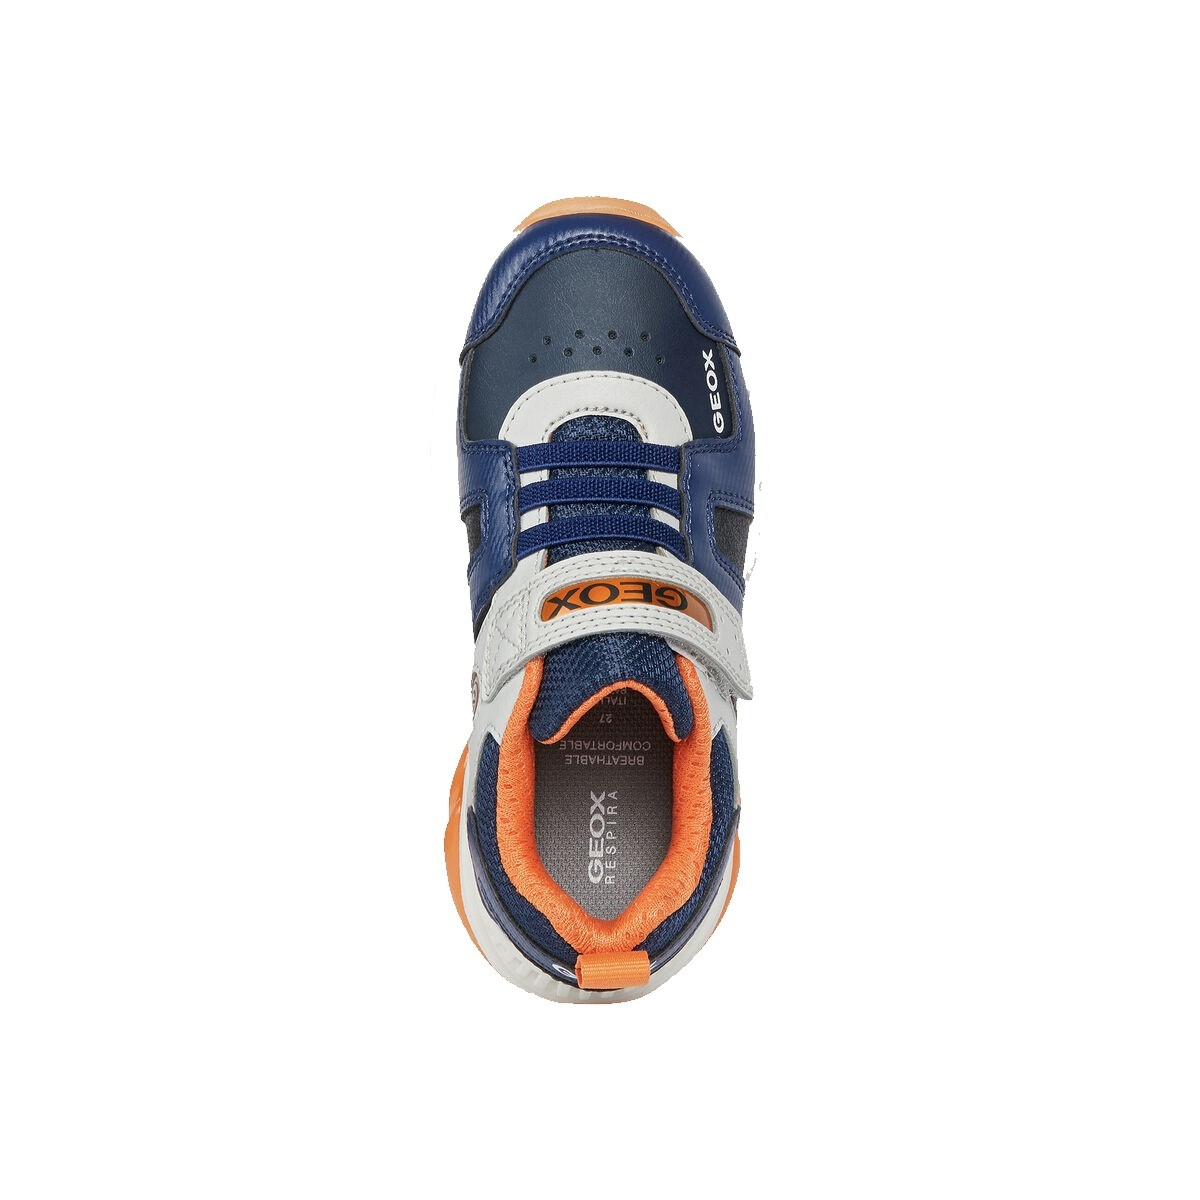 Geox Spaziale Navy Orange